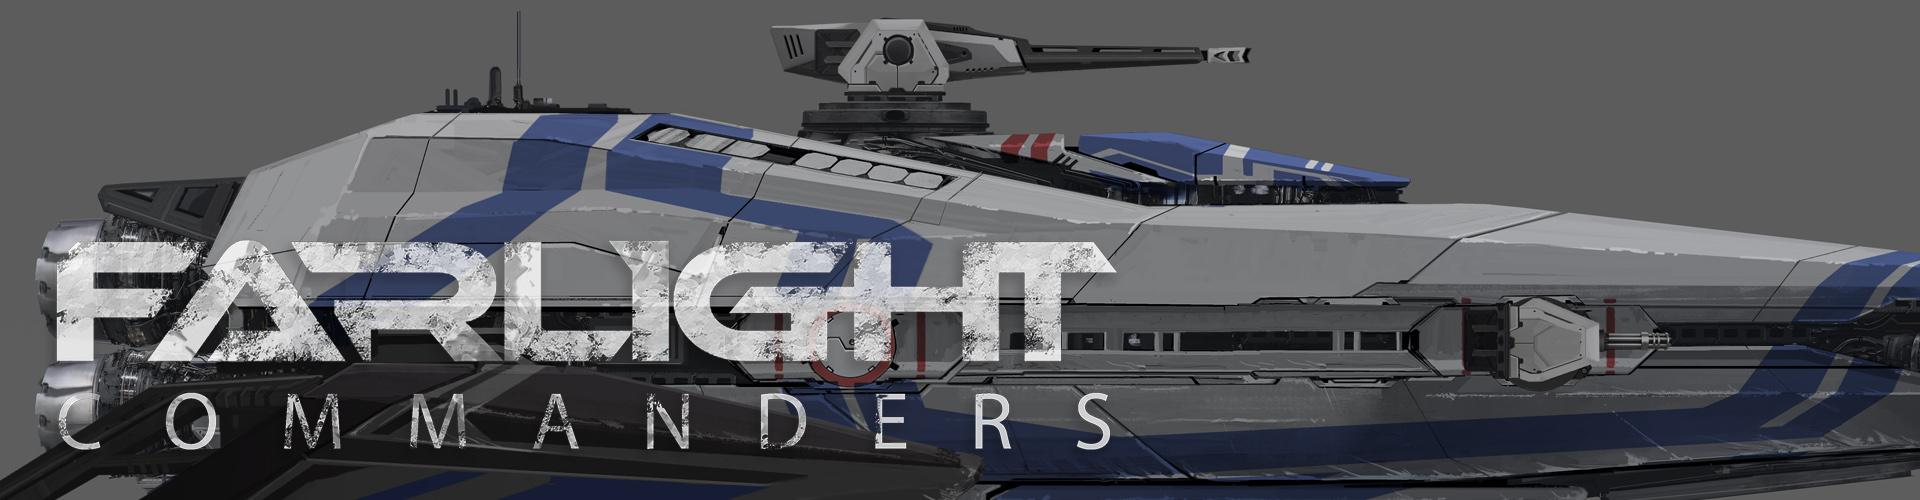 1FarlightCommanders